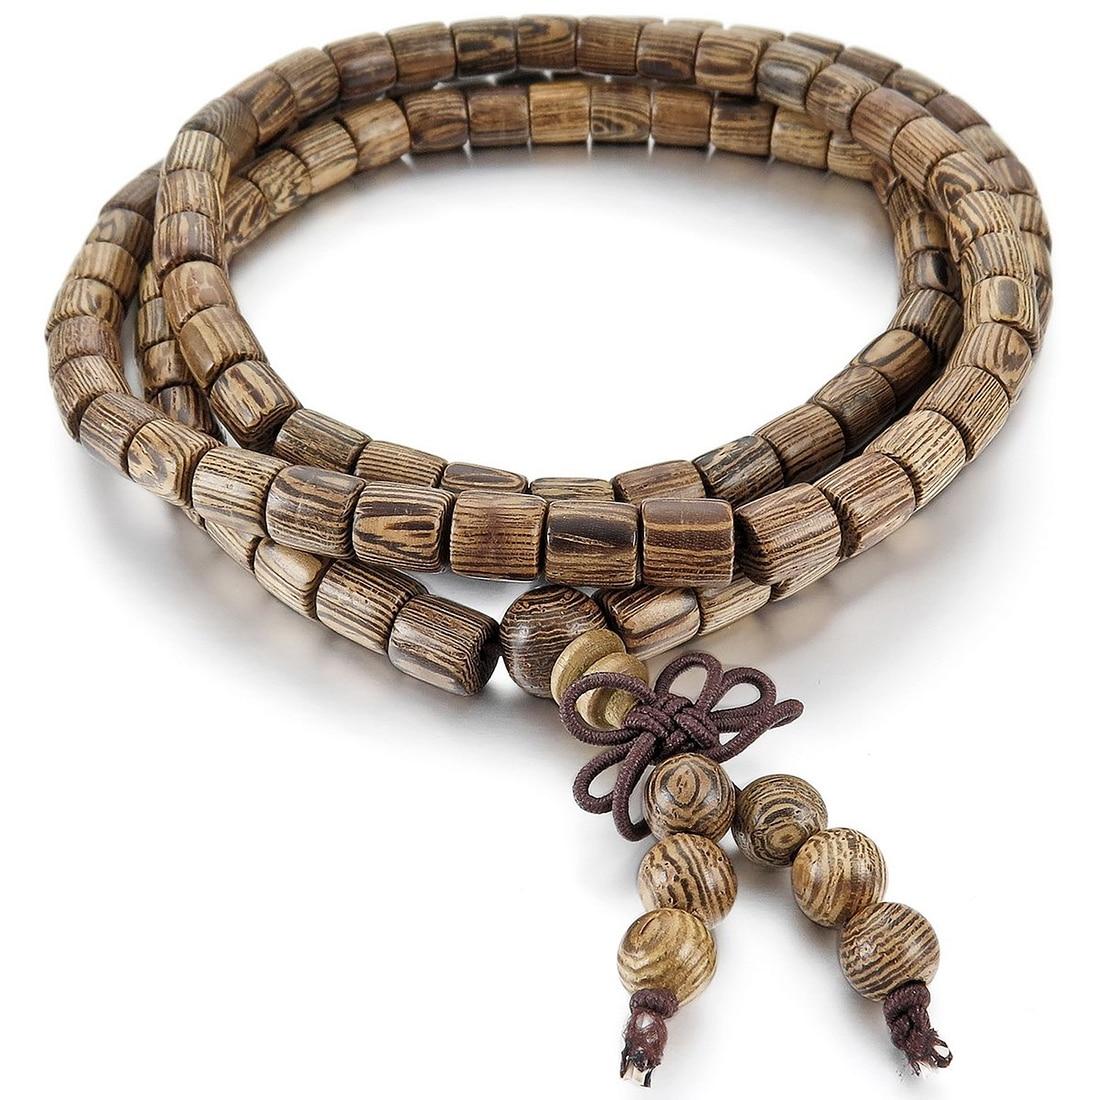 6mm Wood Bracelets Wrist Bracelet Links Tibetan Buddhist Brown Buddha Beads Prayer Prayer Chinese Knot Elastic Man, Woman